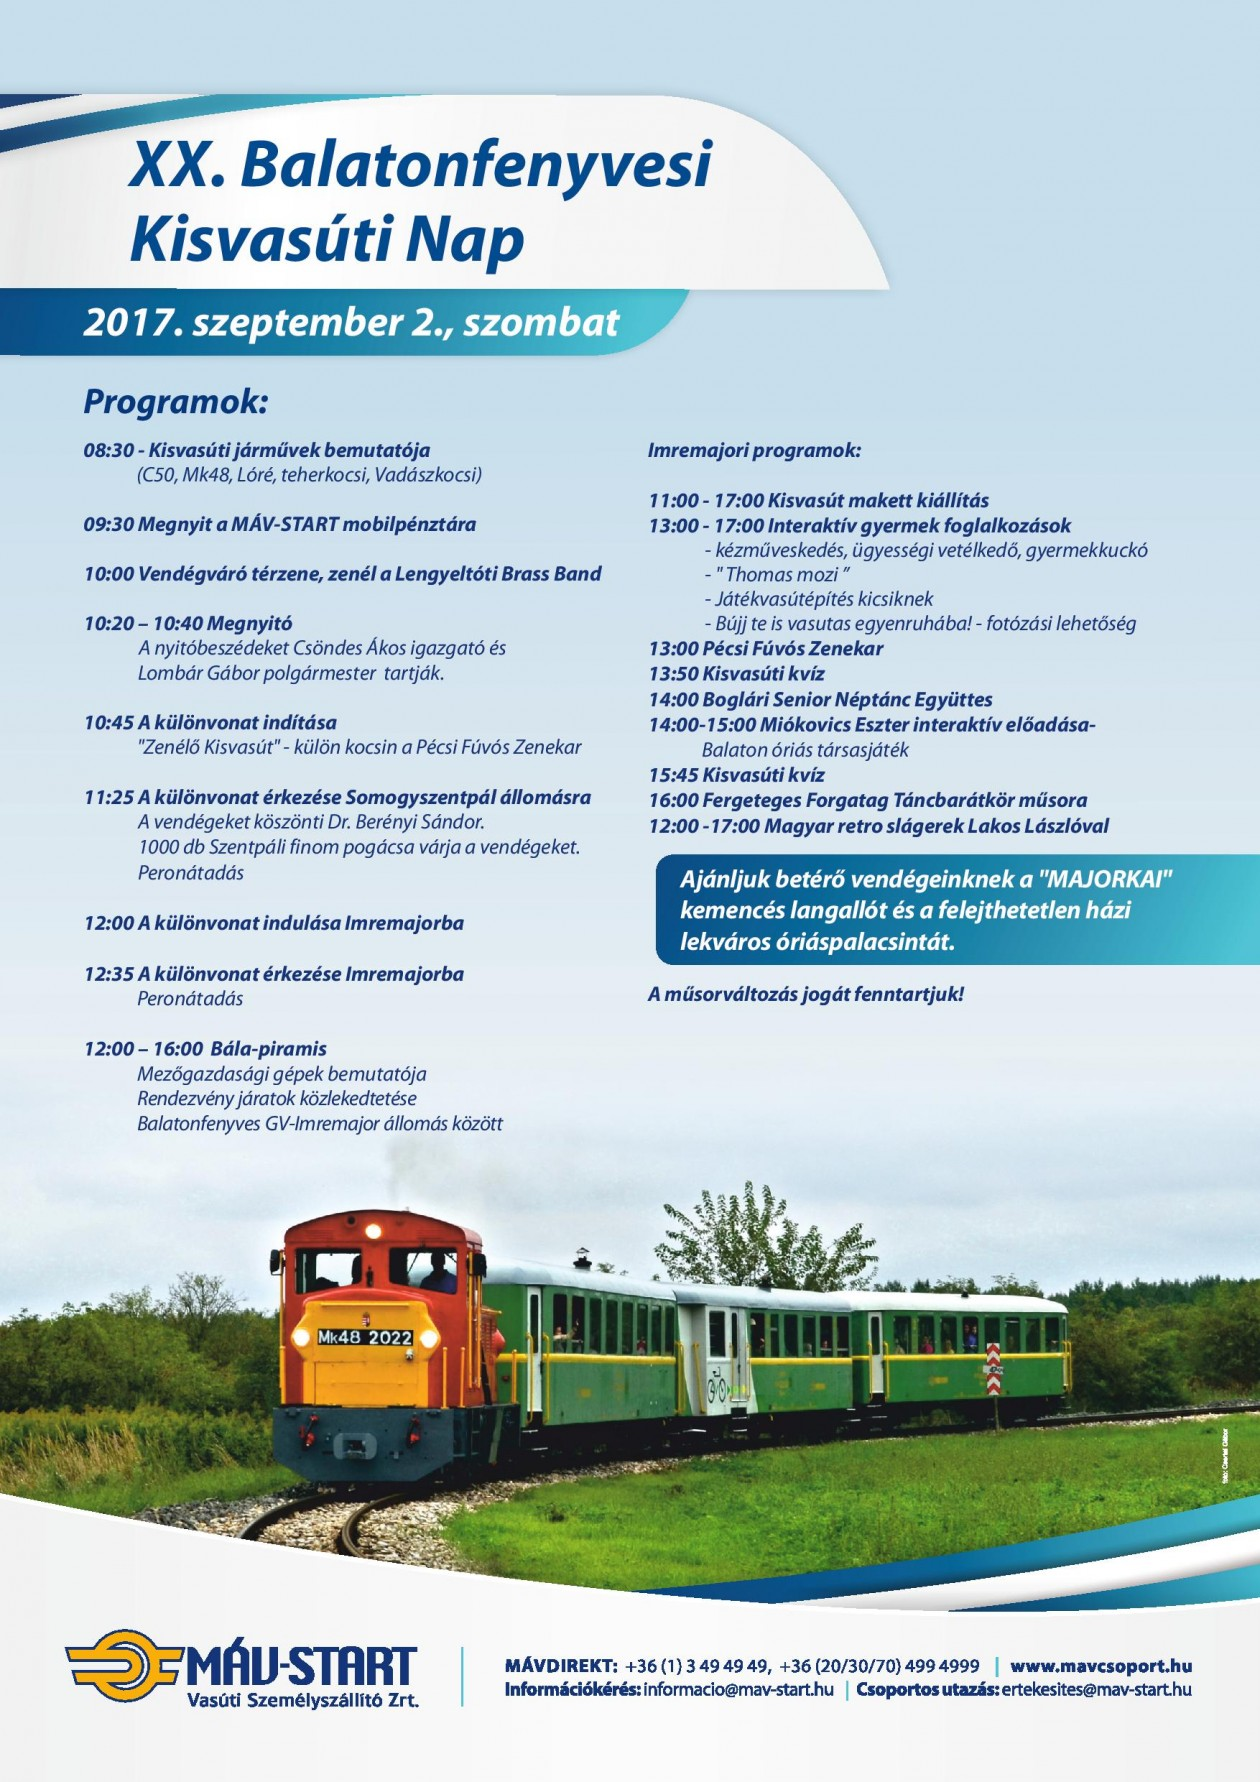 Balatonfenyvesi kisvasúti nap programja 2017